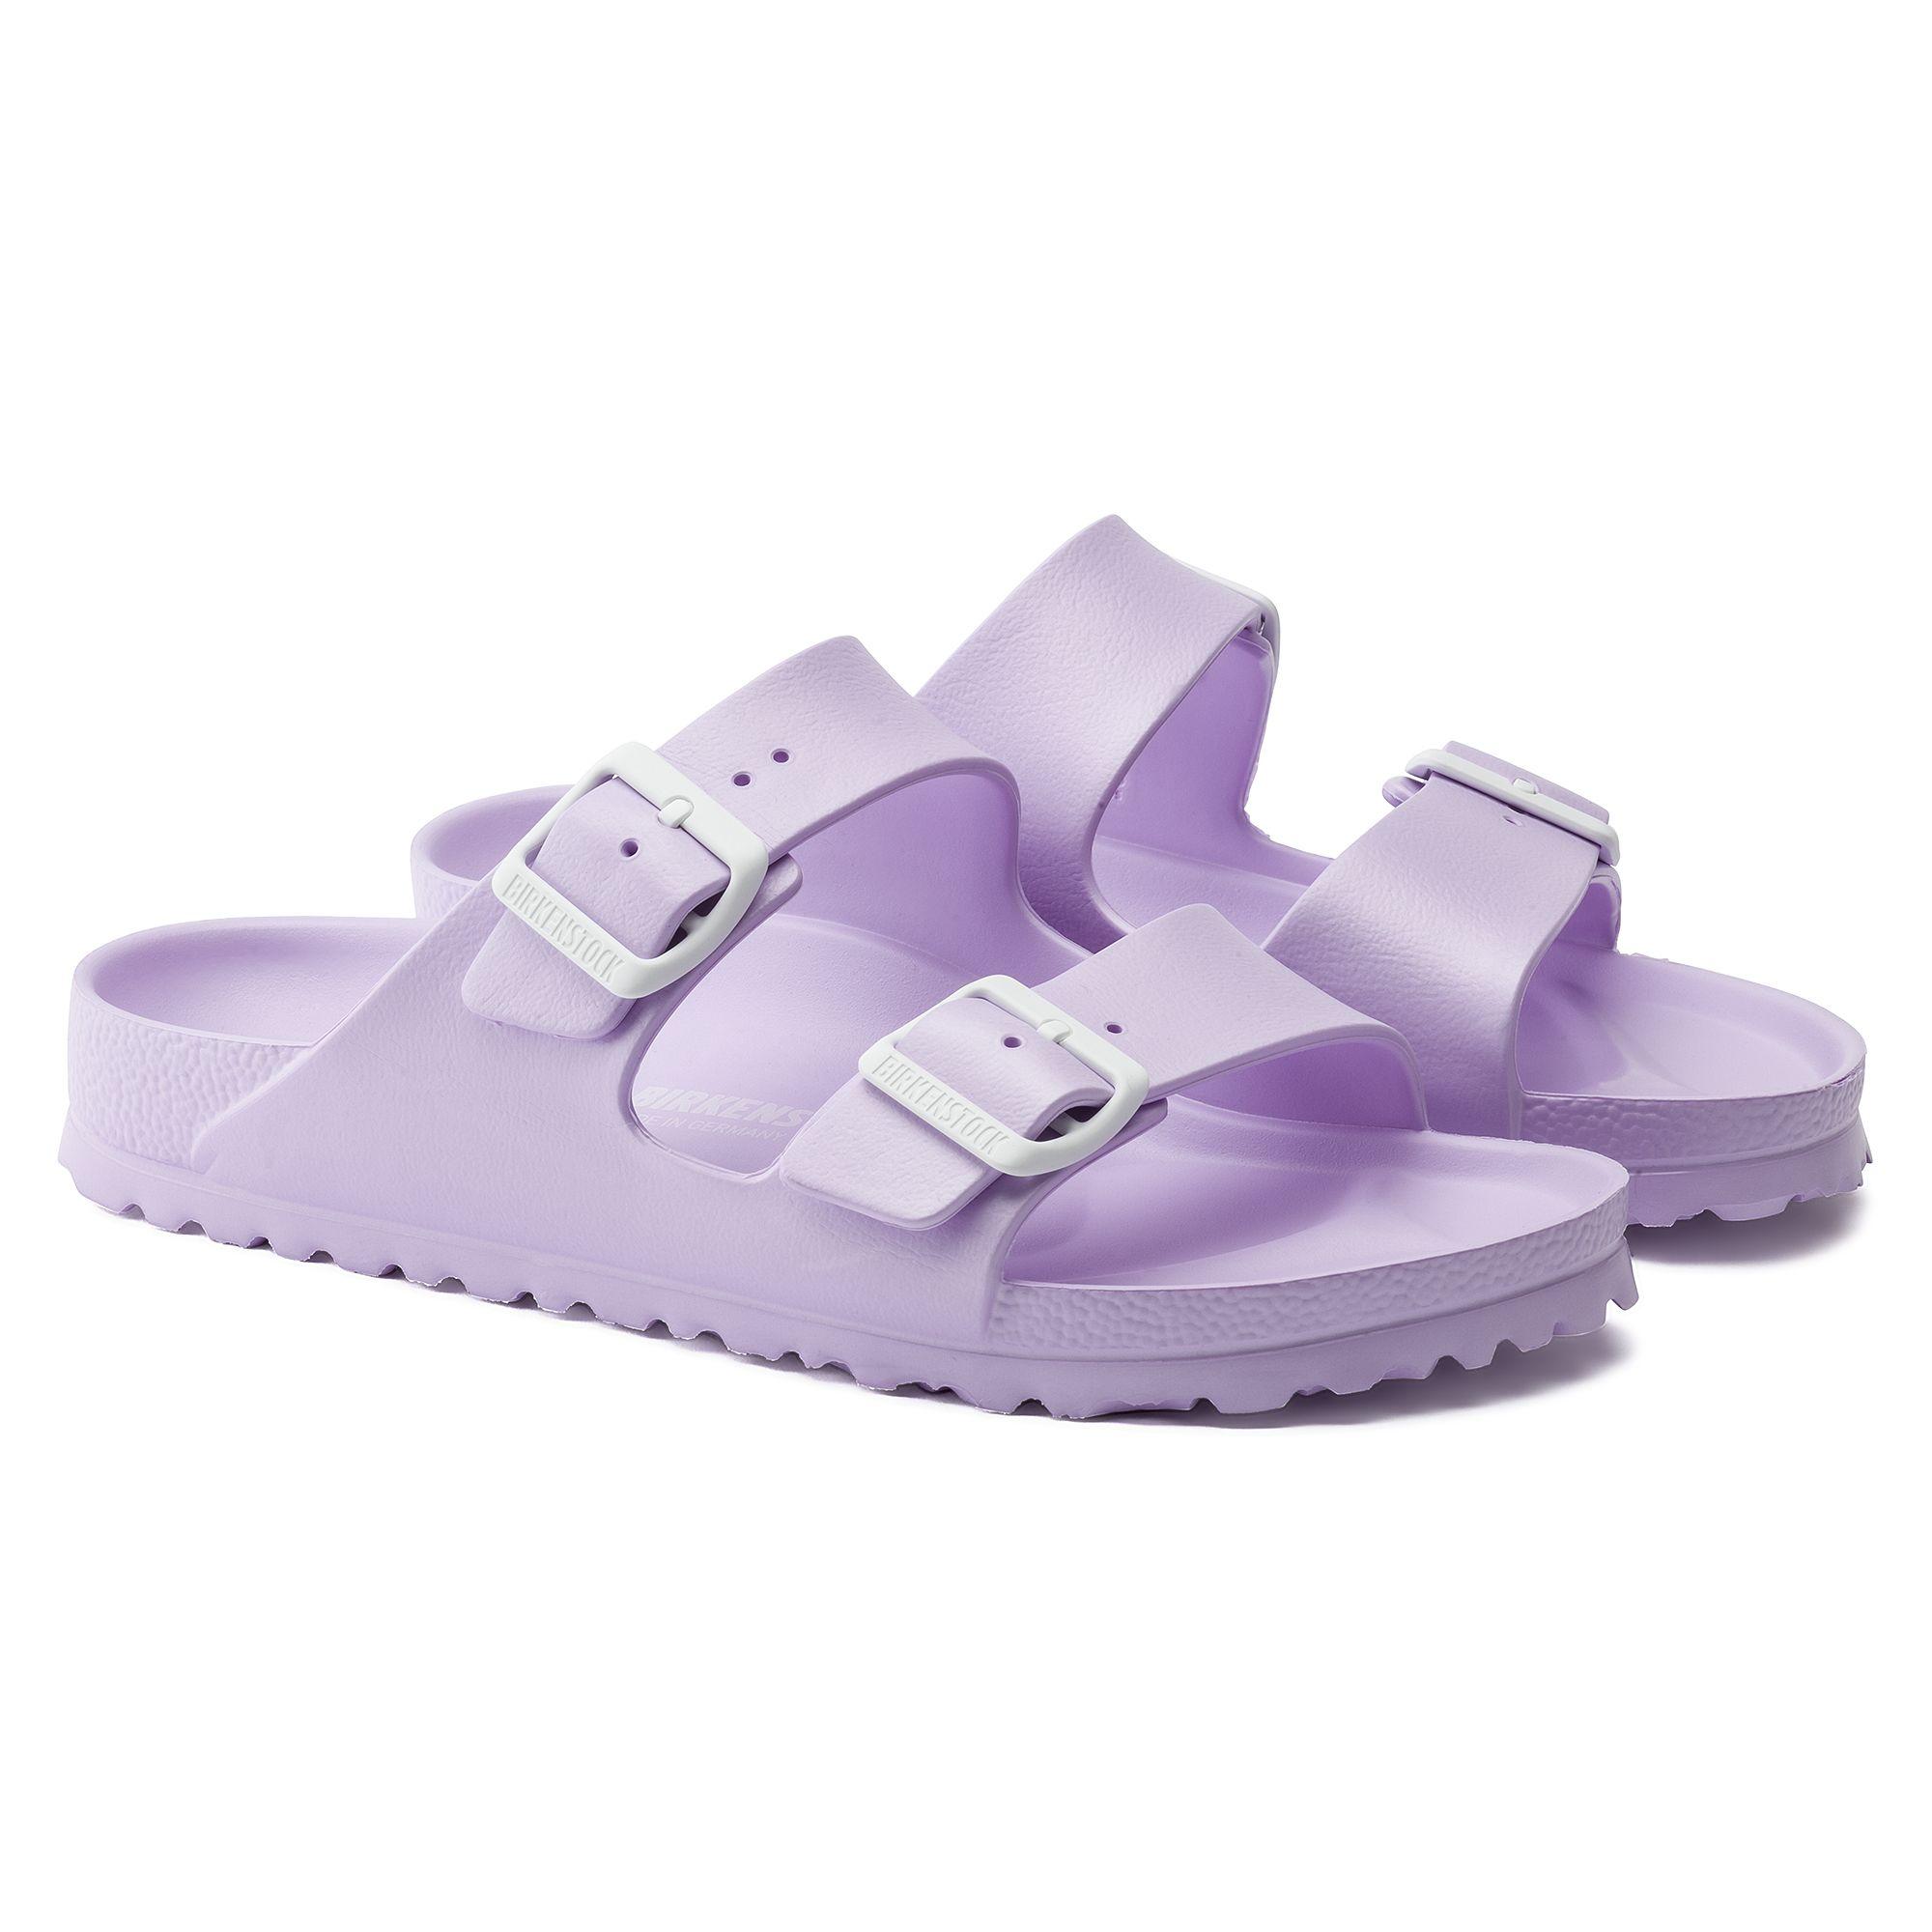 Arizona EVA | Shower shoes, Shoes